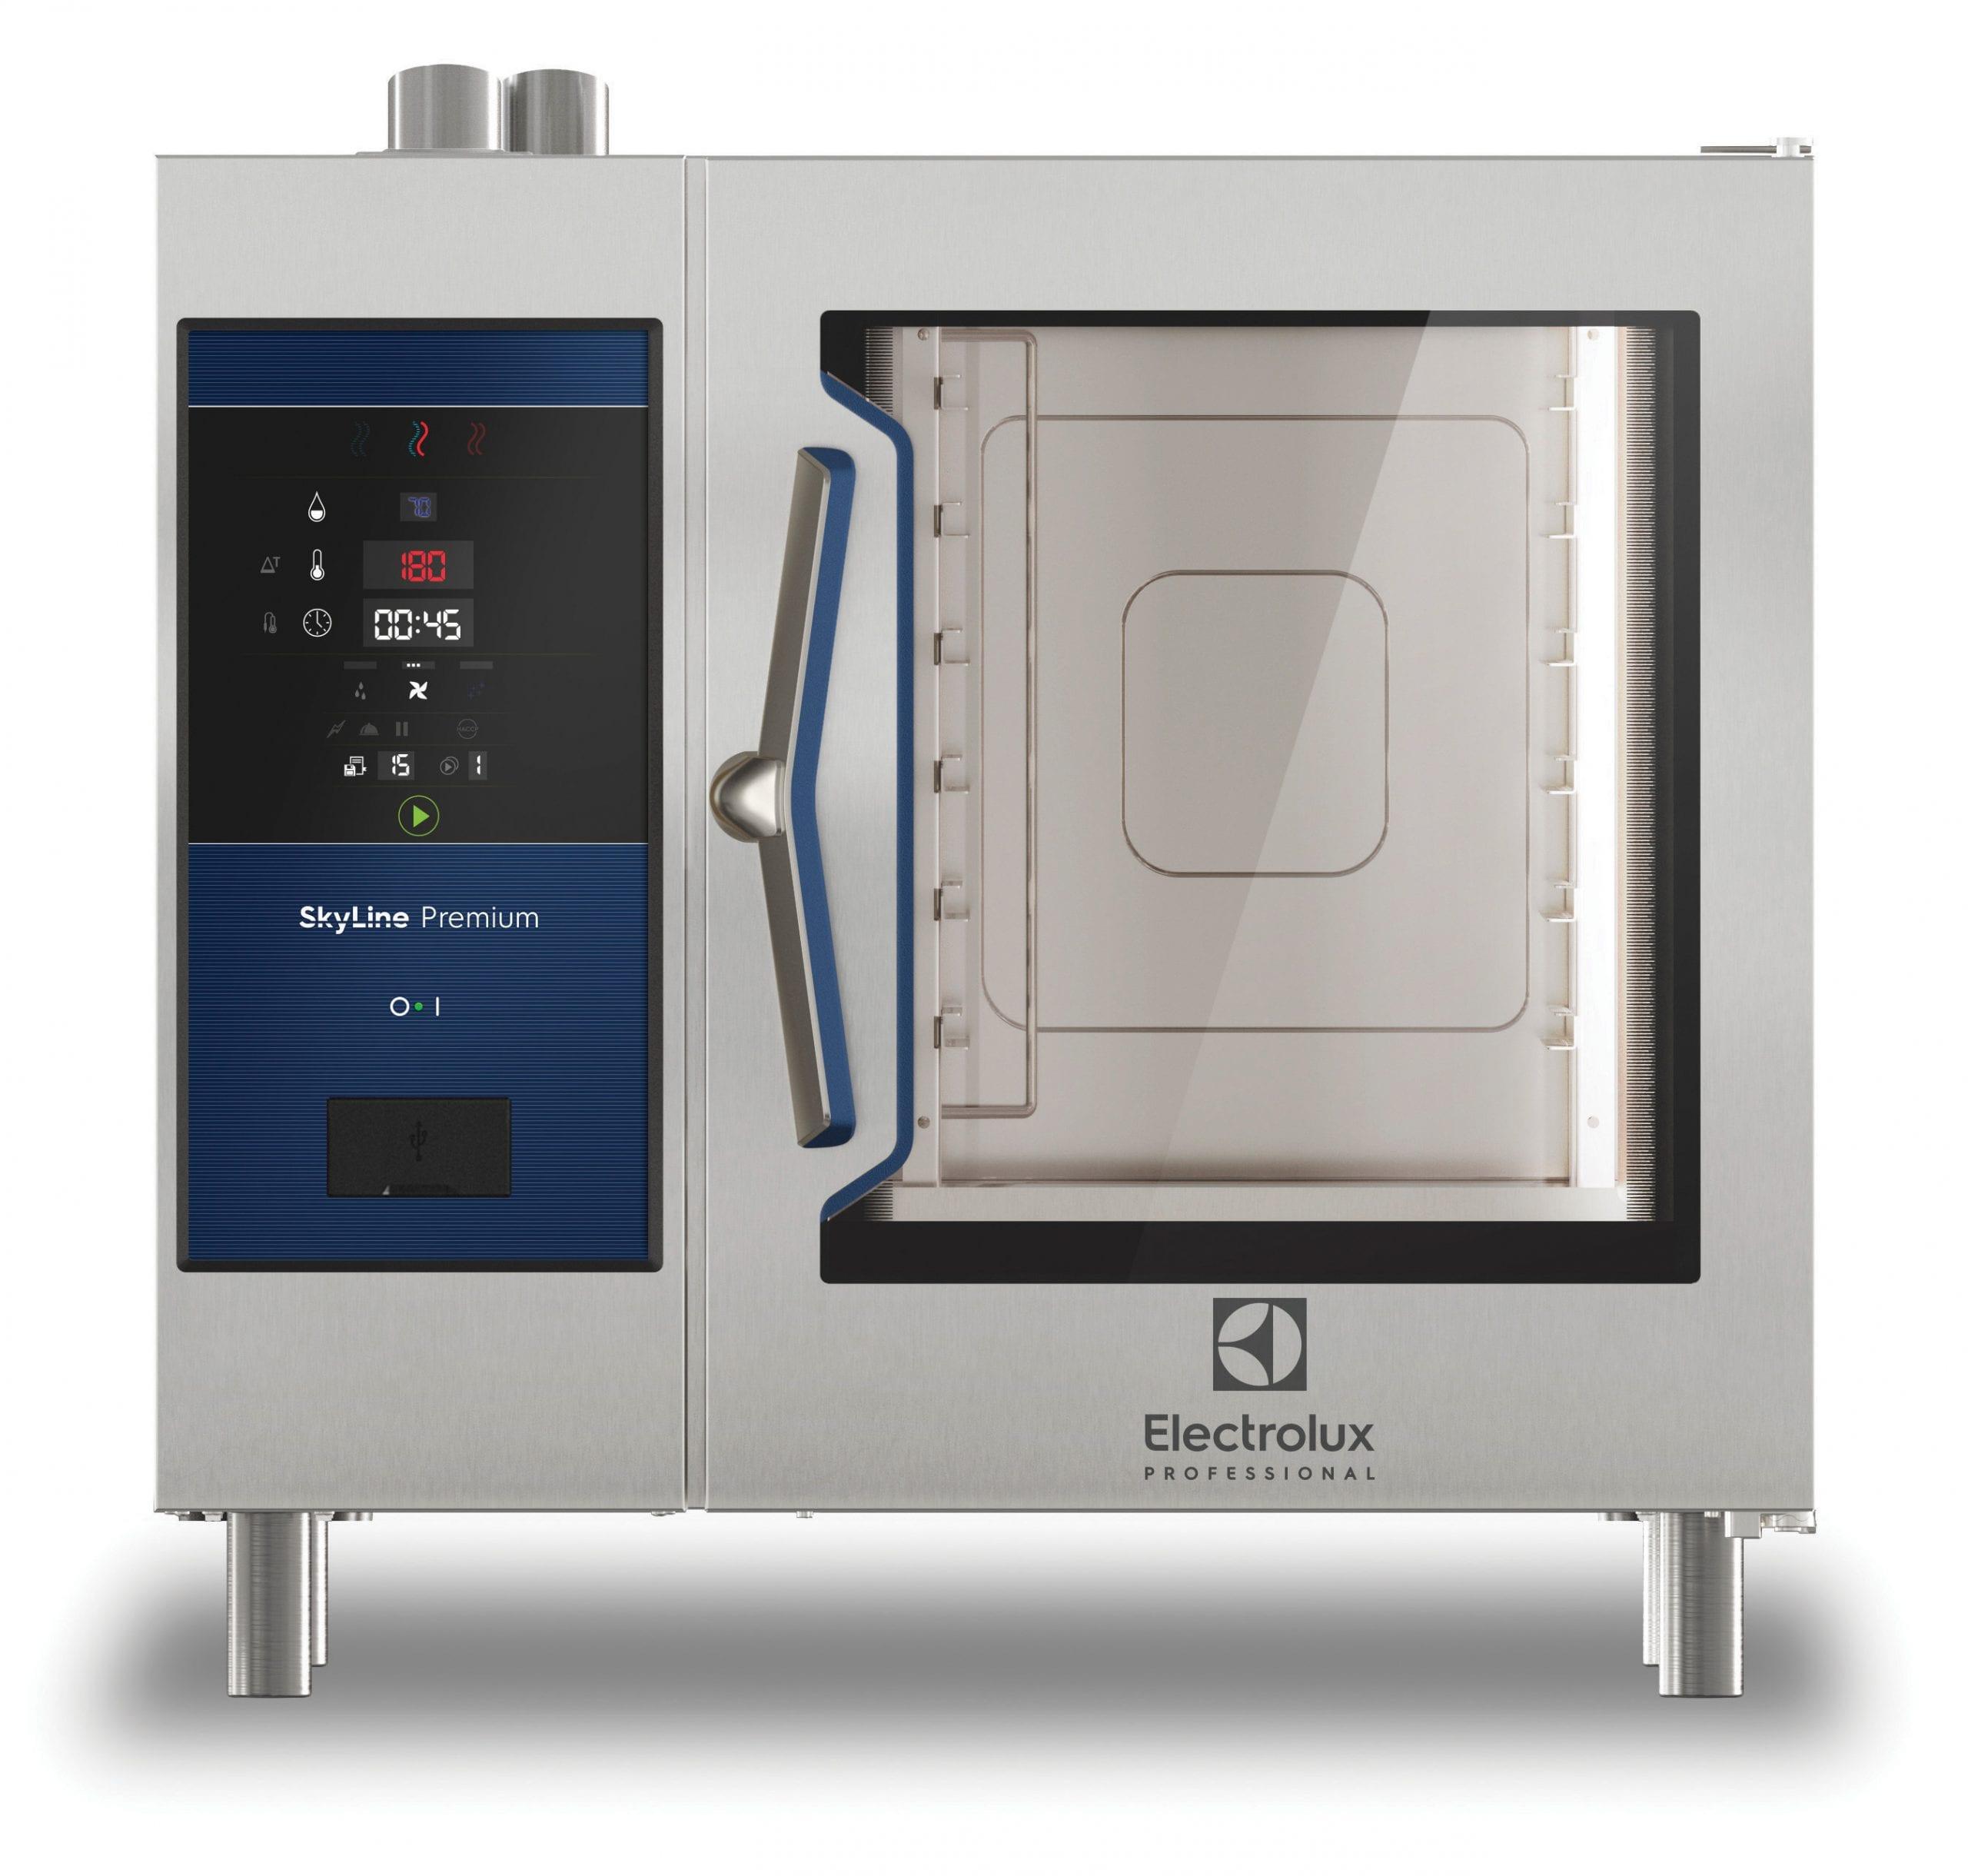 Combi Oven Skyline Pro S 6 GN 1/1 Image